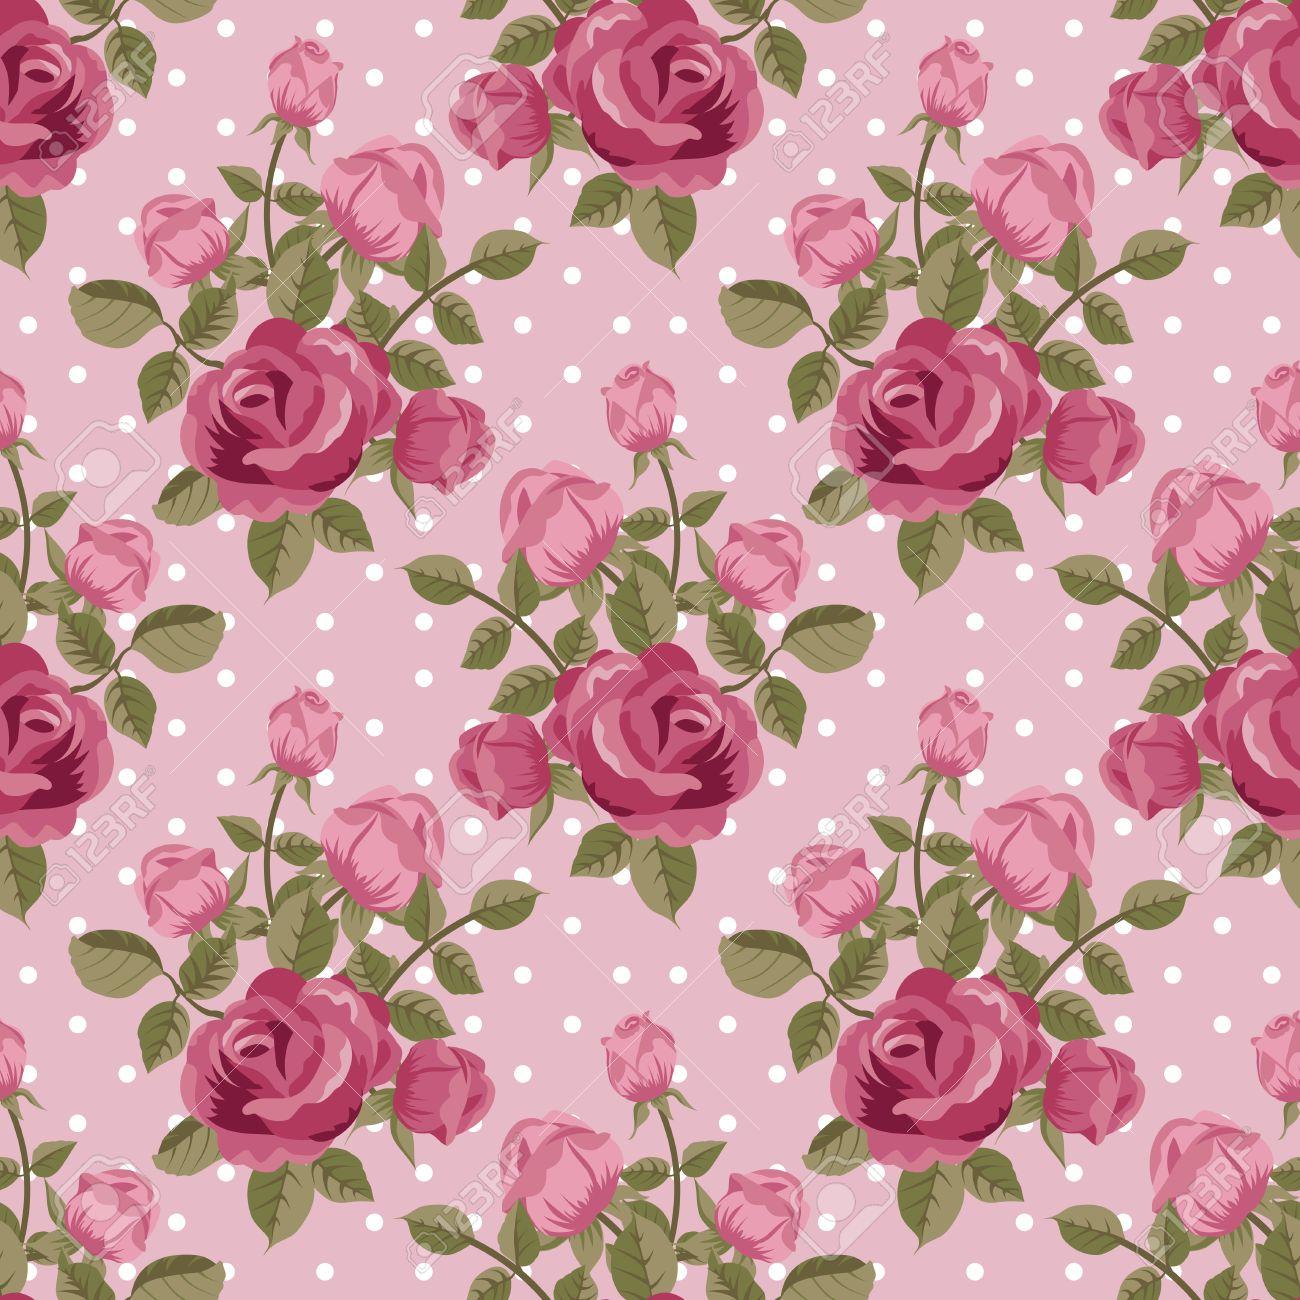 Pink rose wallpaper seamless pattern Stock Vector - 29844140